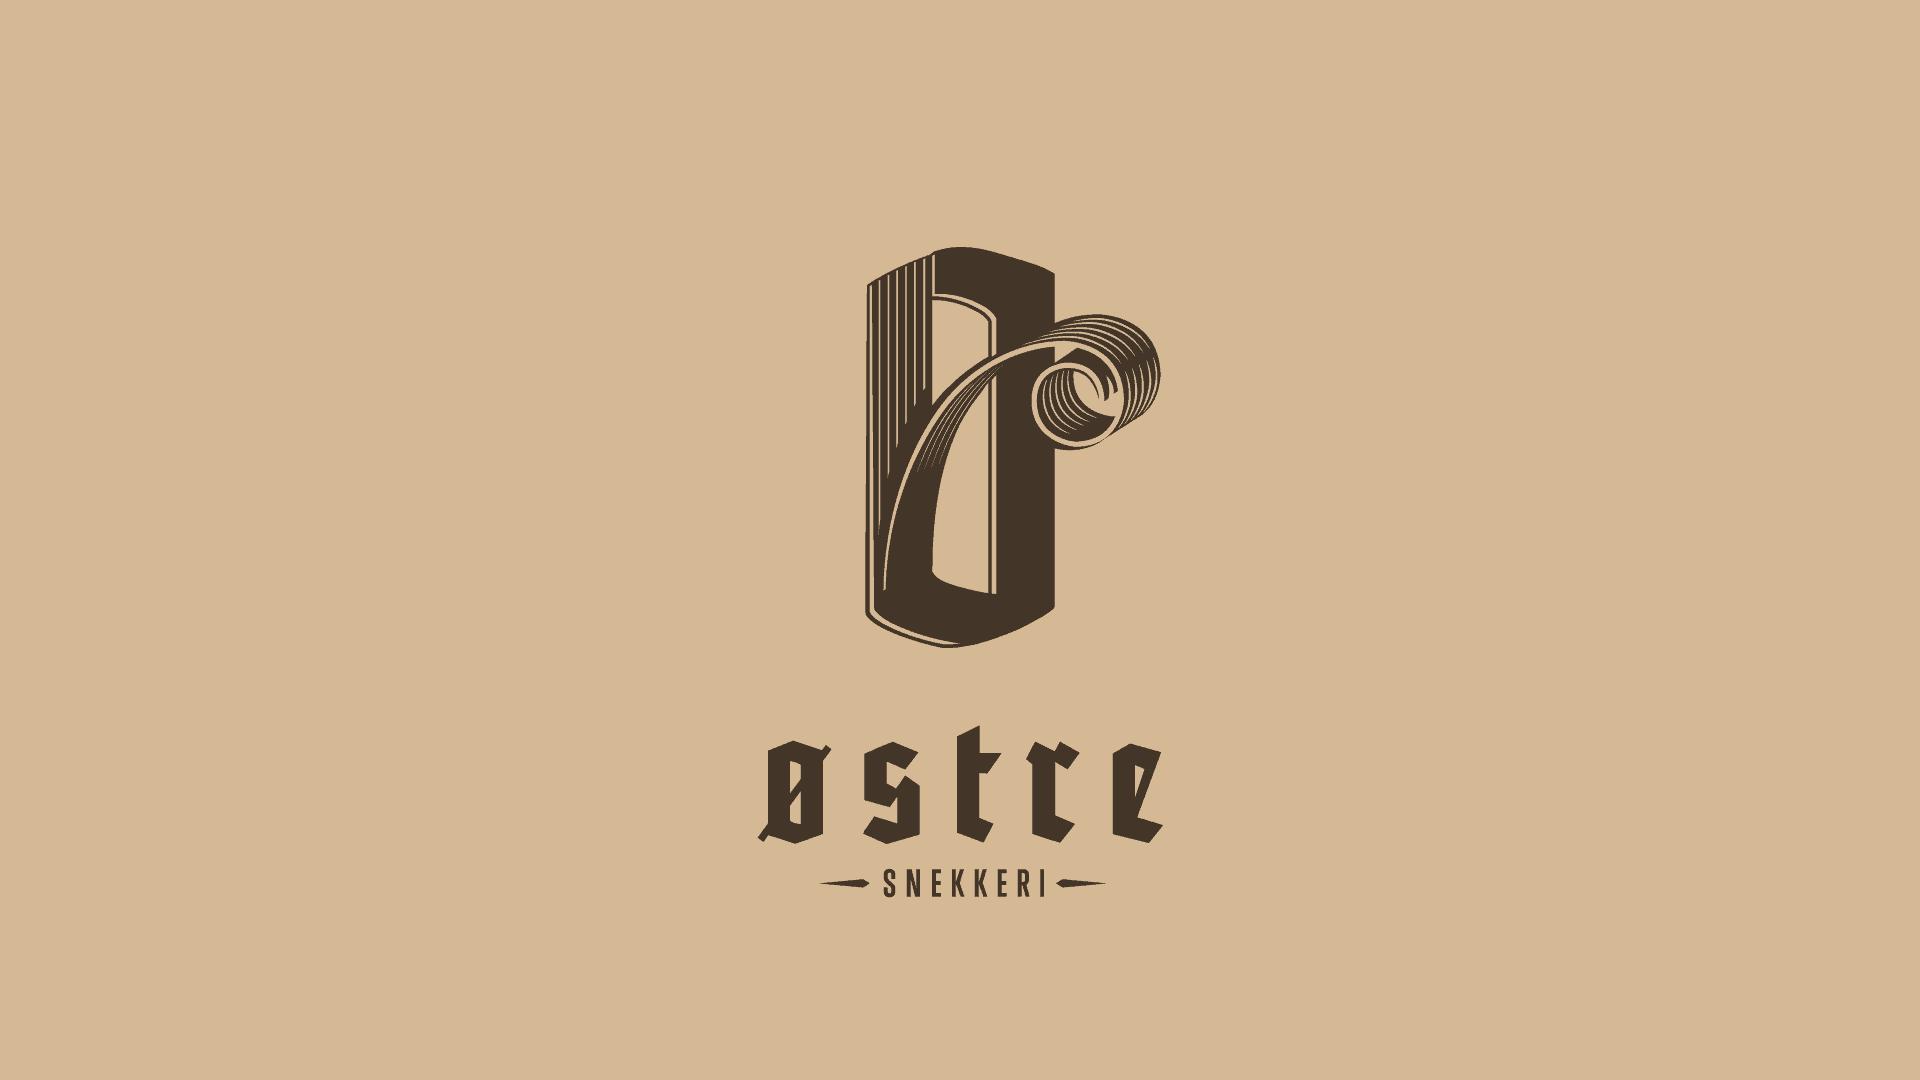 Østre - A Chip of the New Block